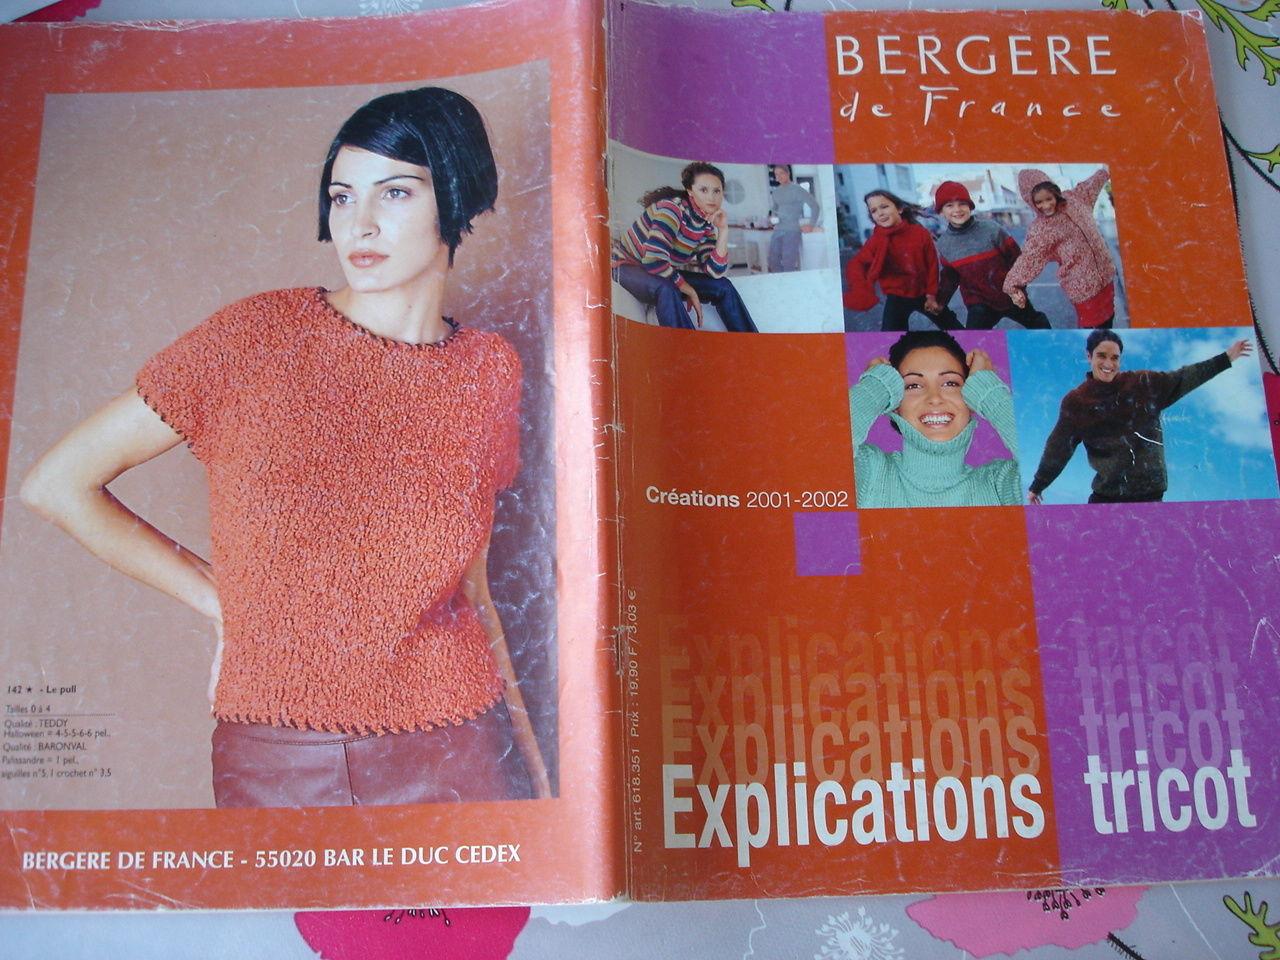 livre catalogue explications guide tricot berg re de france cr ations 2001 2002 ebay. Black Bedroom Furniture Sets. Home Design Ideas